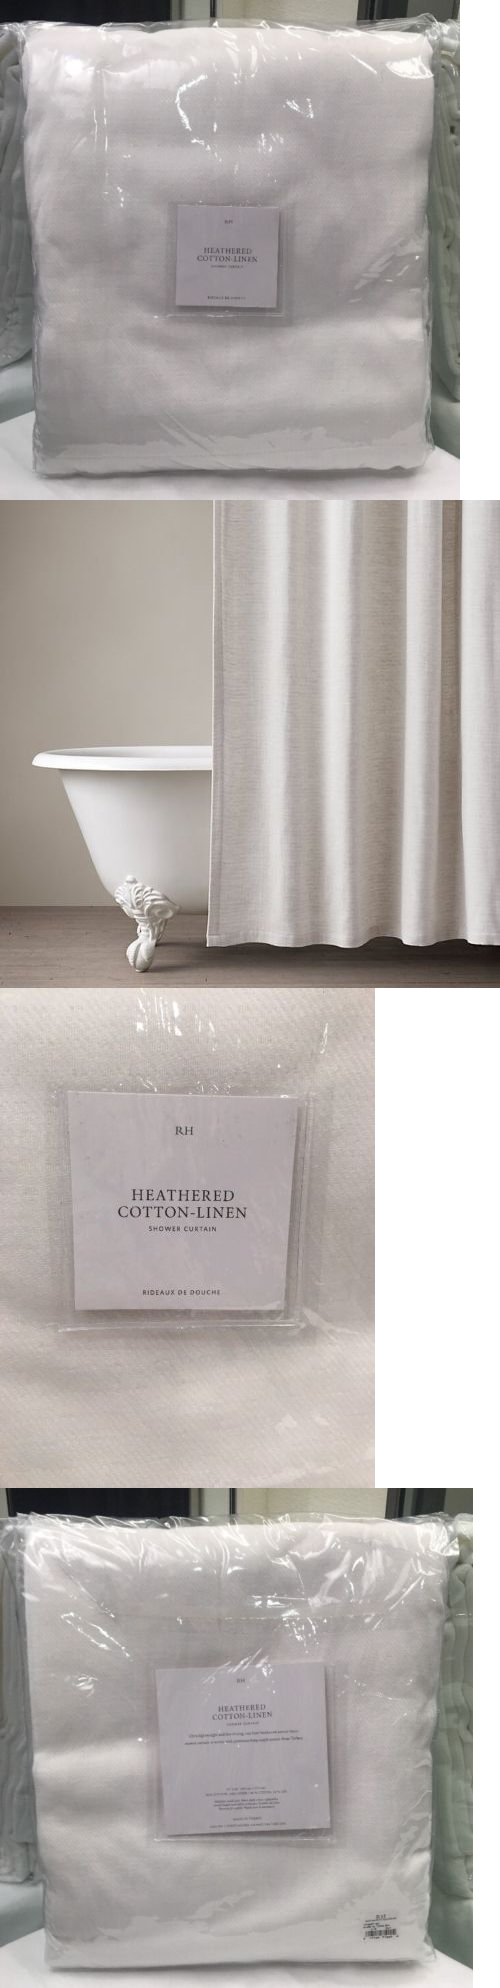 Shower Curtains 20441: Restoration Hardware Heathered Cotton Linen Shower  Curtain X Long White